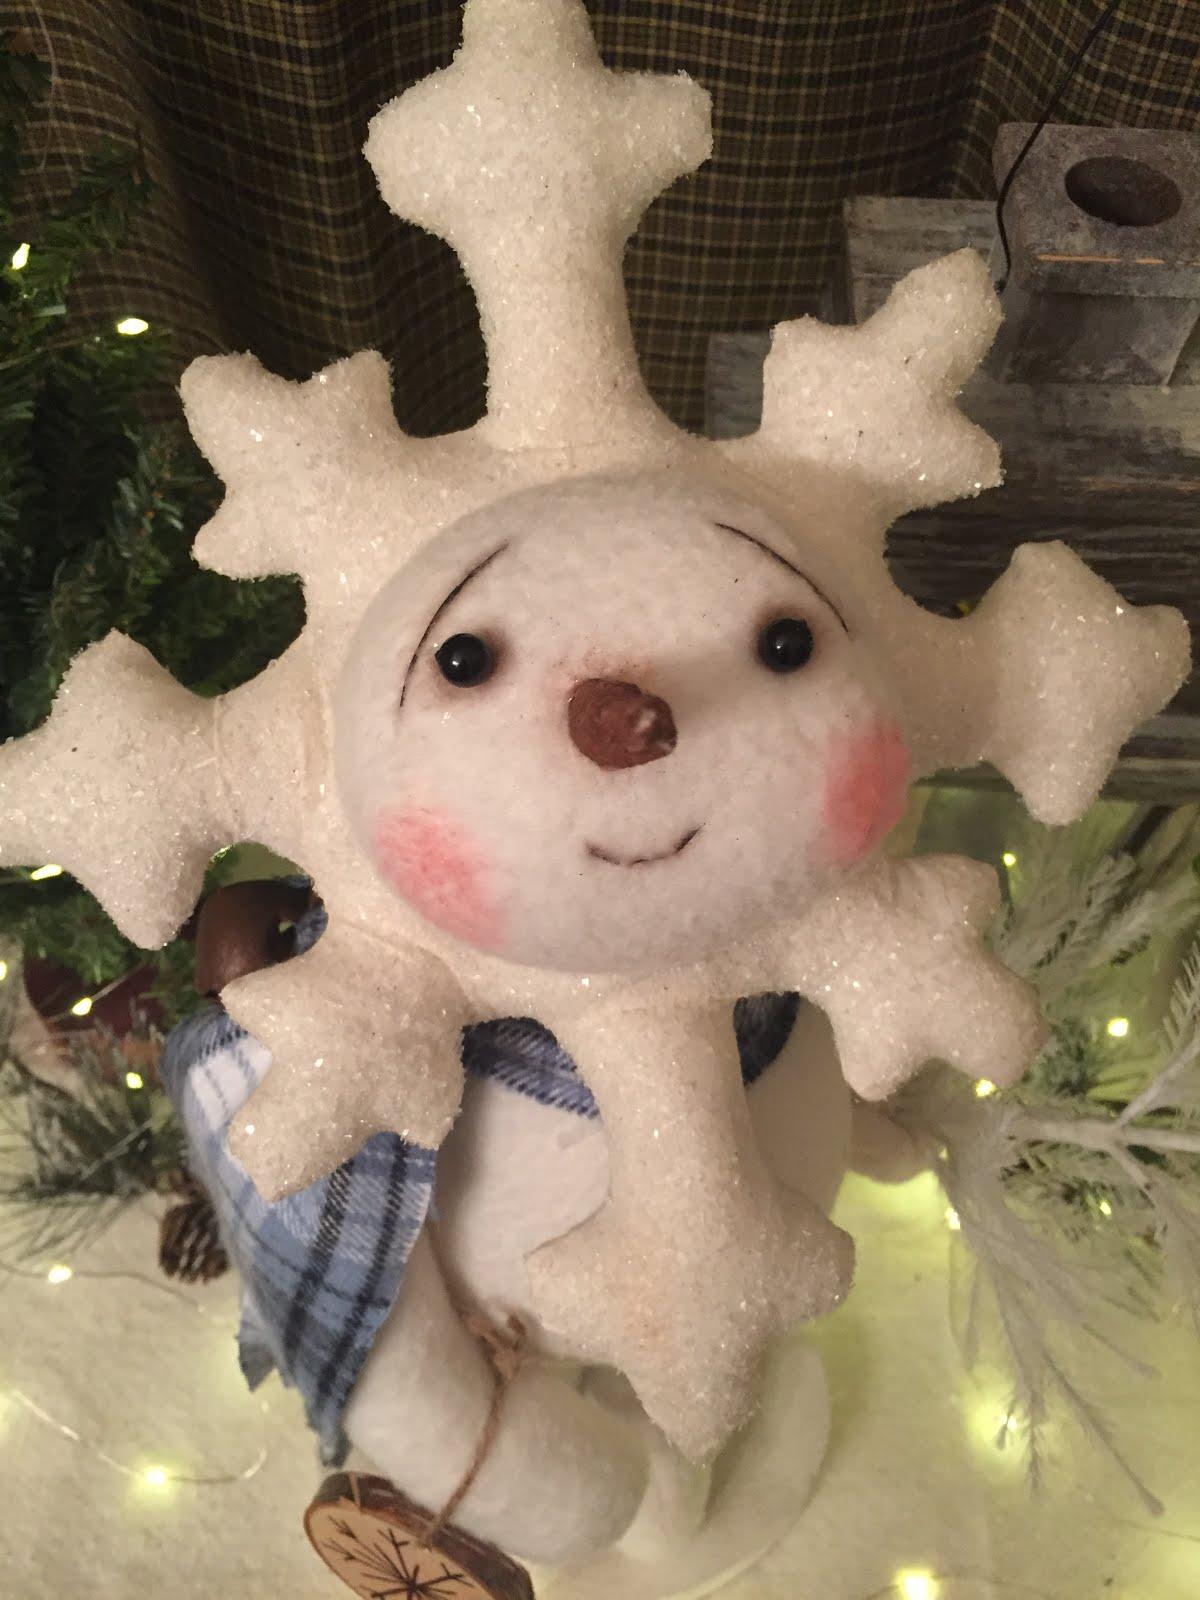 Mr Snowflake